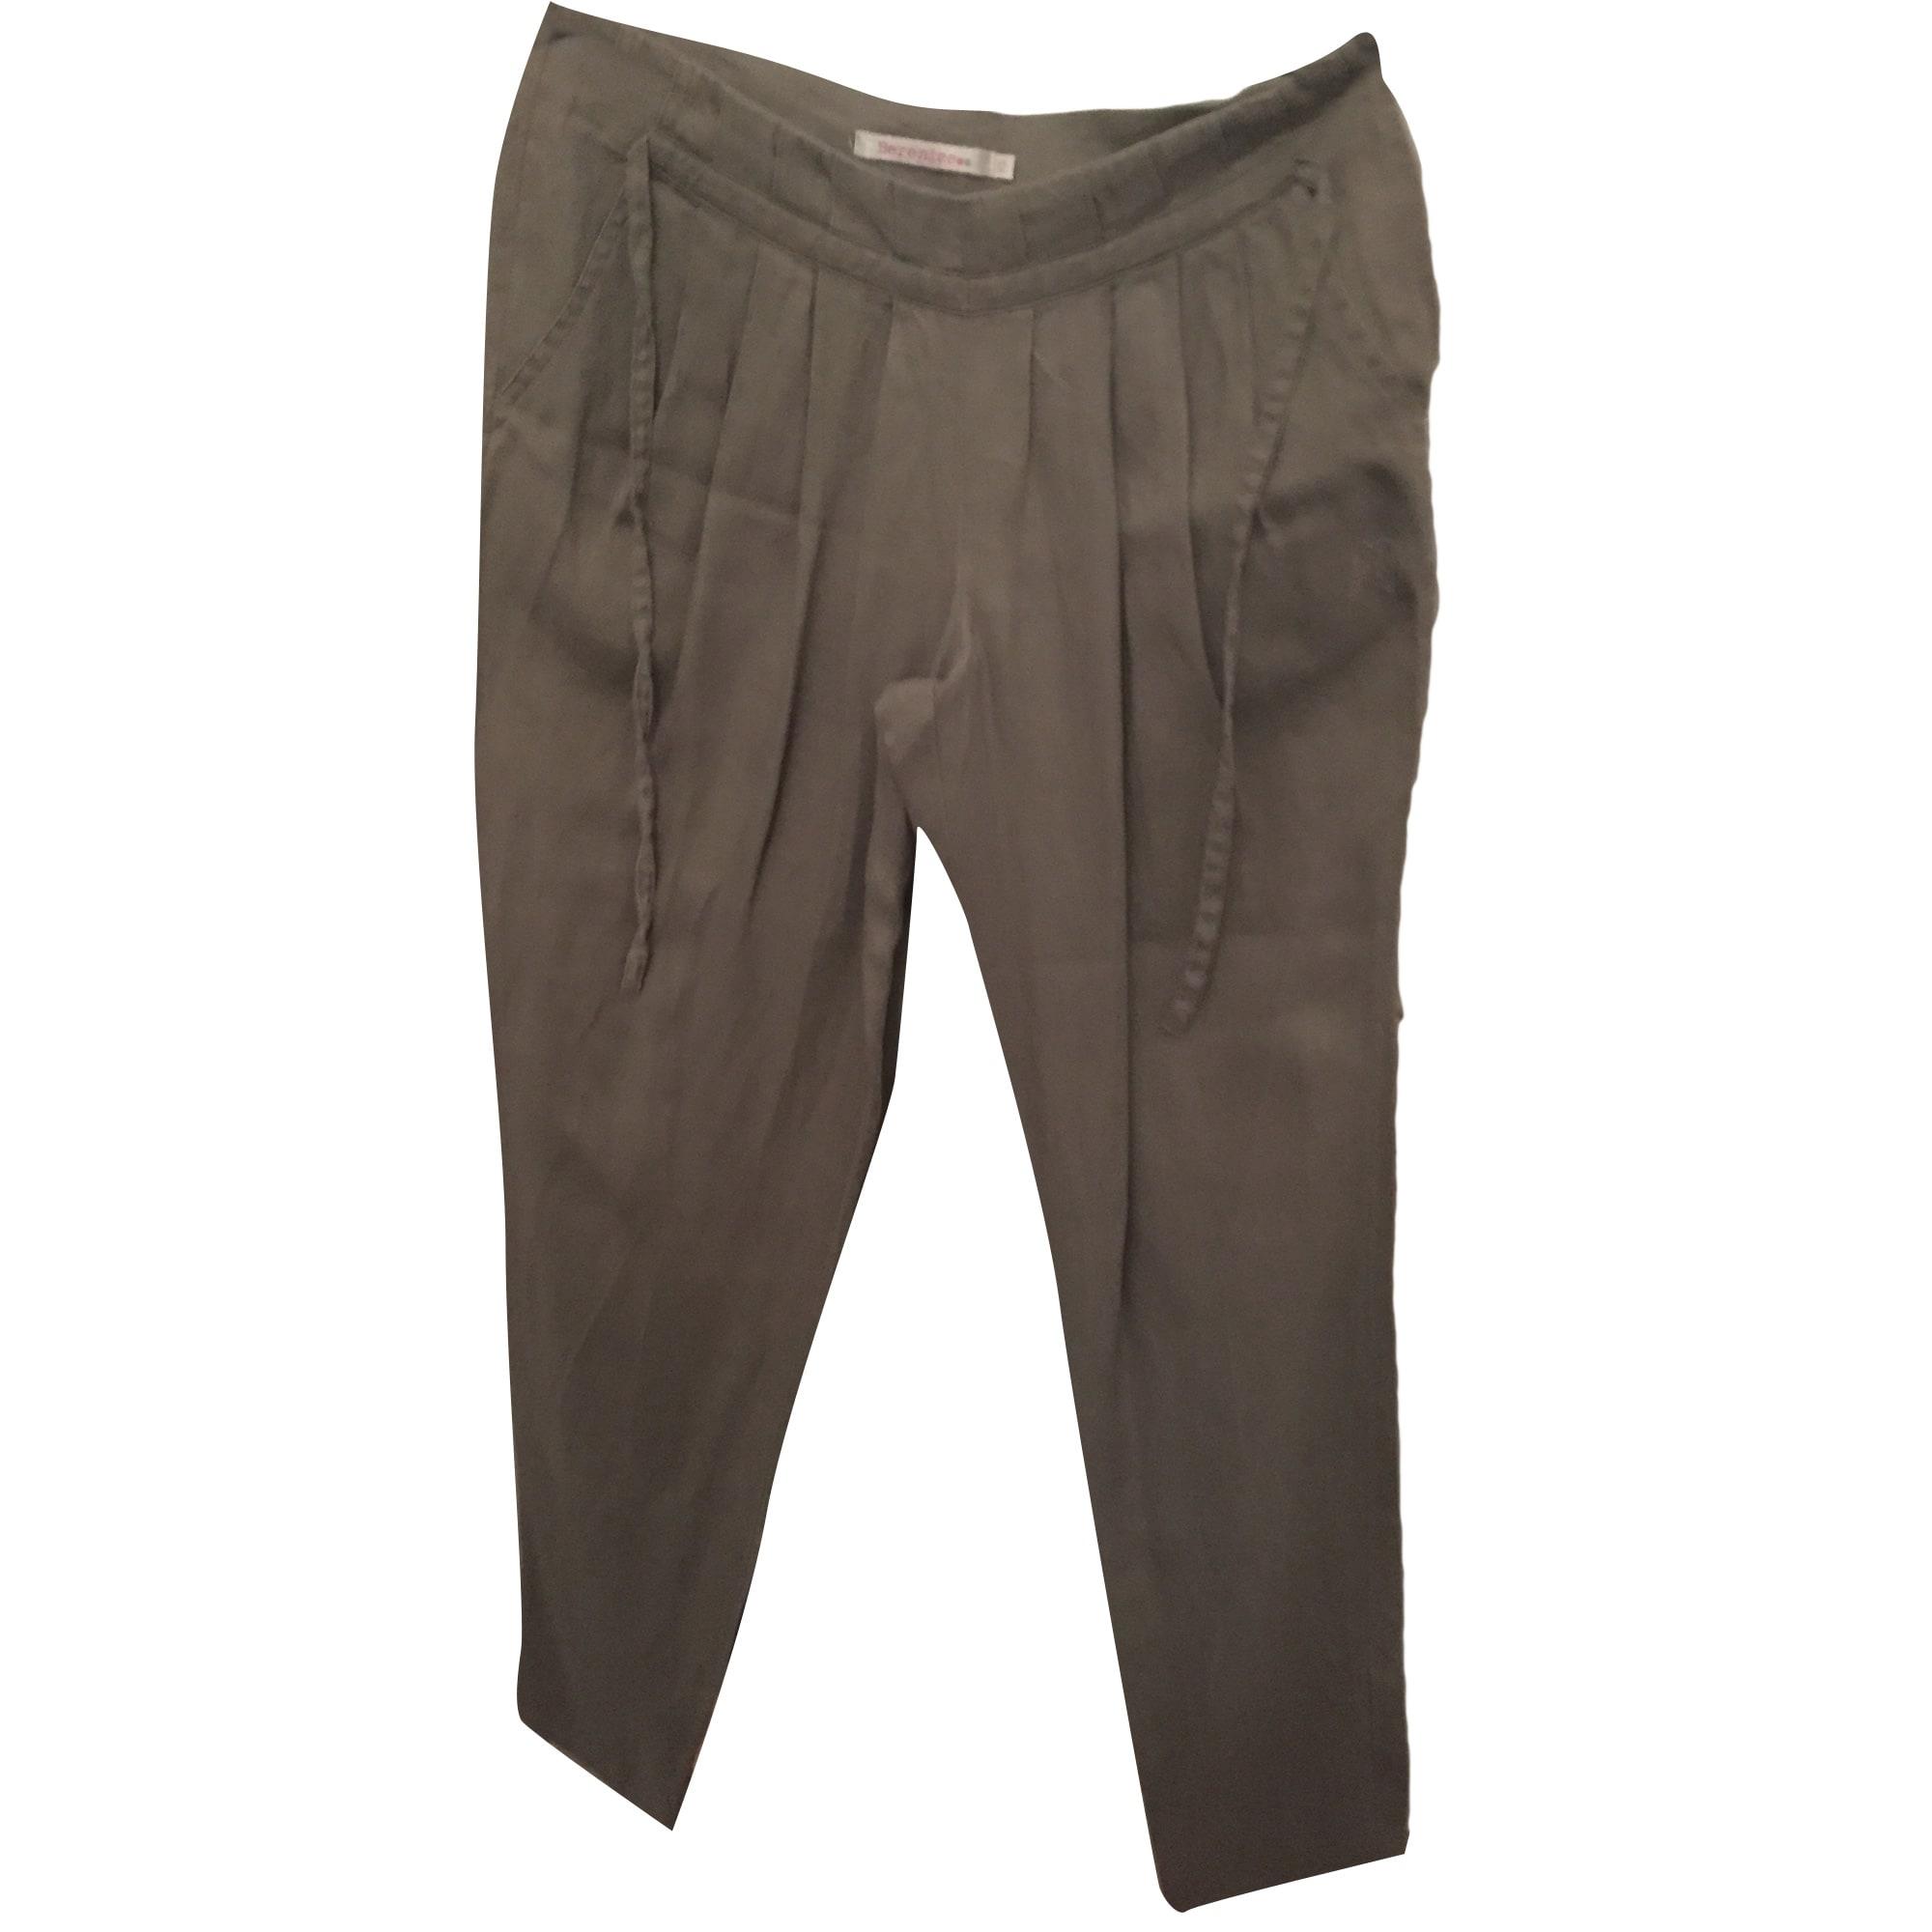 Pantalon carotte BERENICE Beige, camel